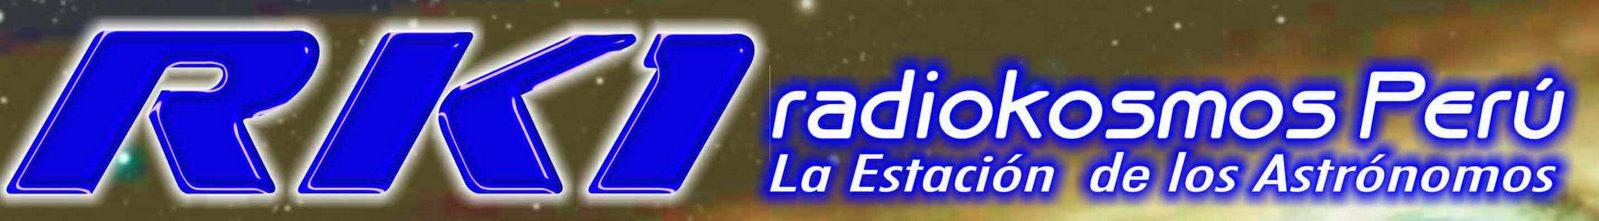 Radiokosmos Peru